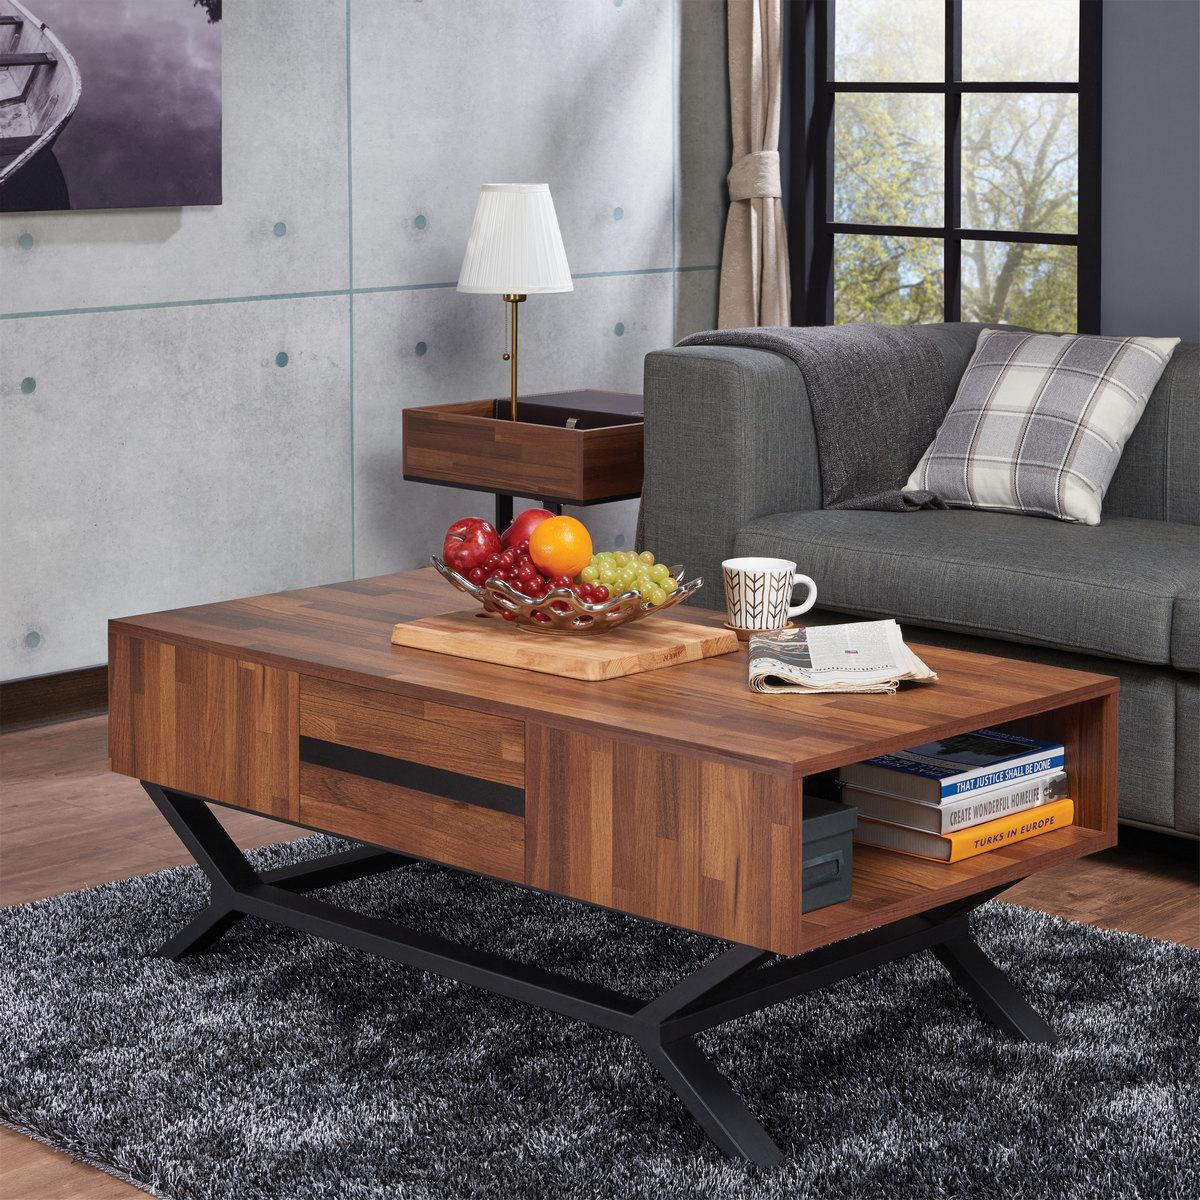 Furniture | Walnut | Coffee | Table | Black